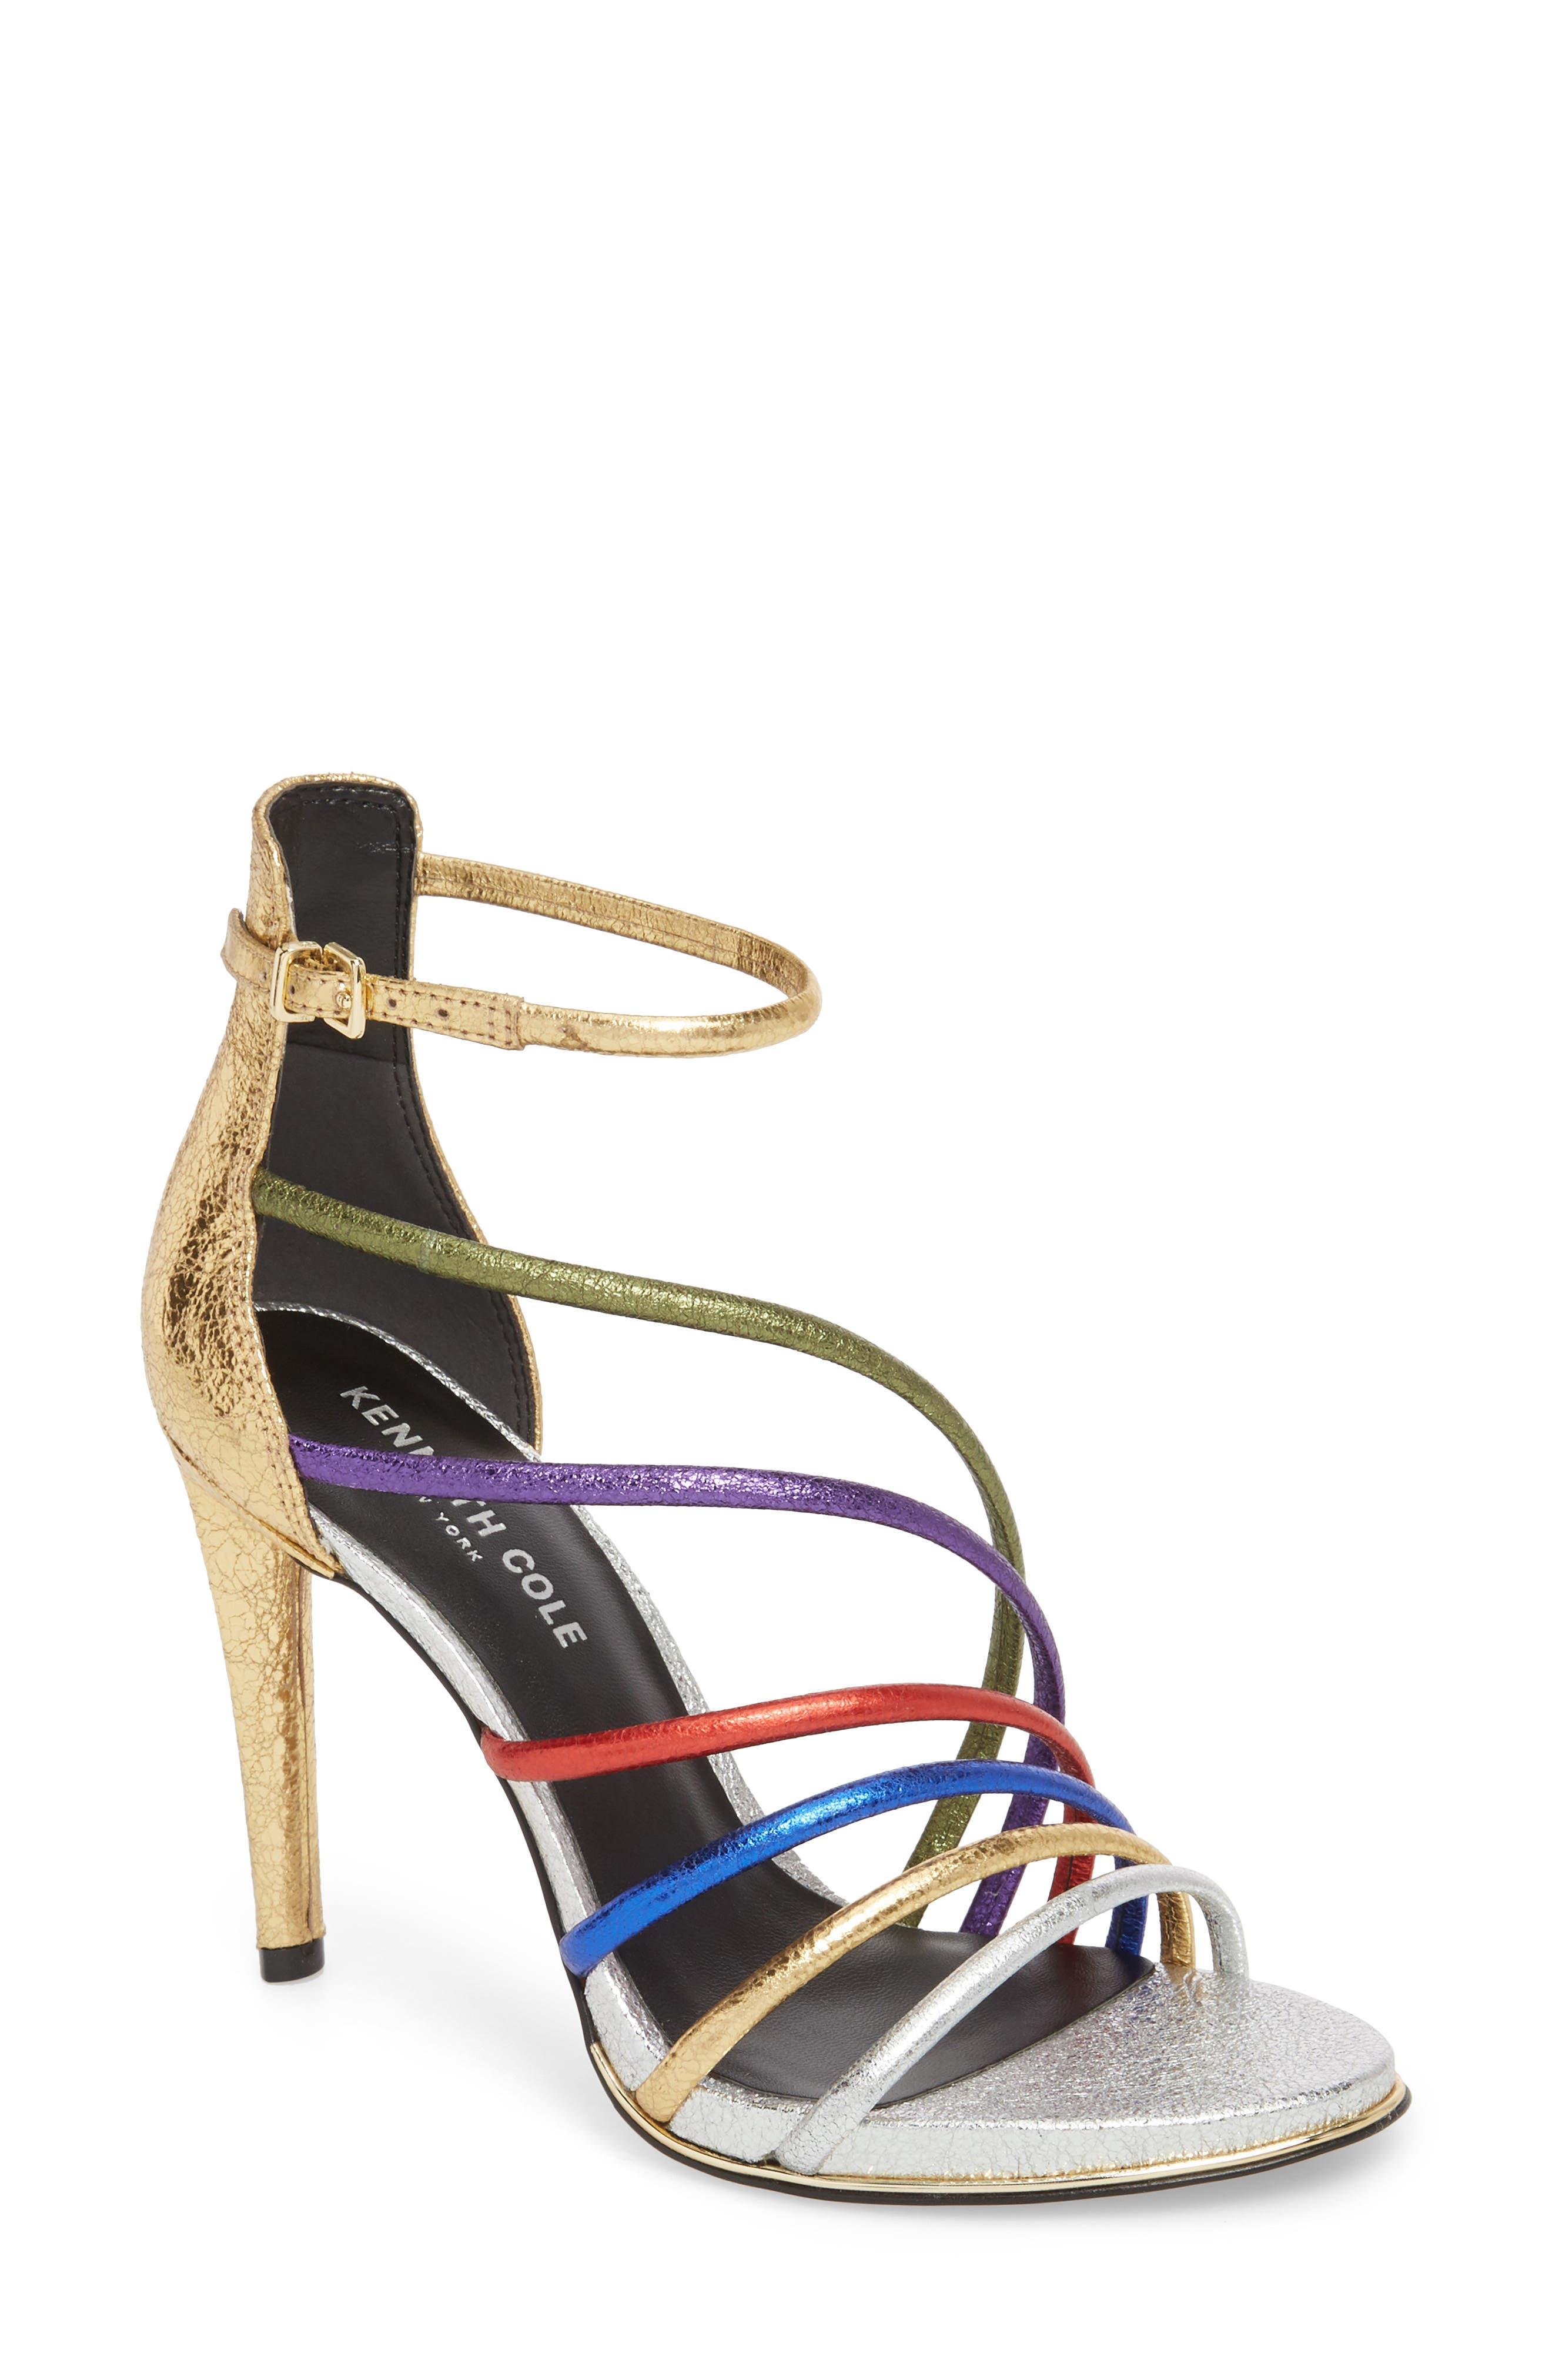 Barletta Asymmetrical Strappy Sandal,                         Main,                         color, MULTI LEATHER